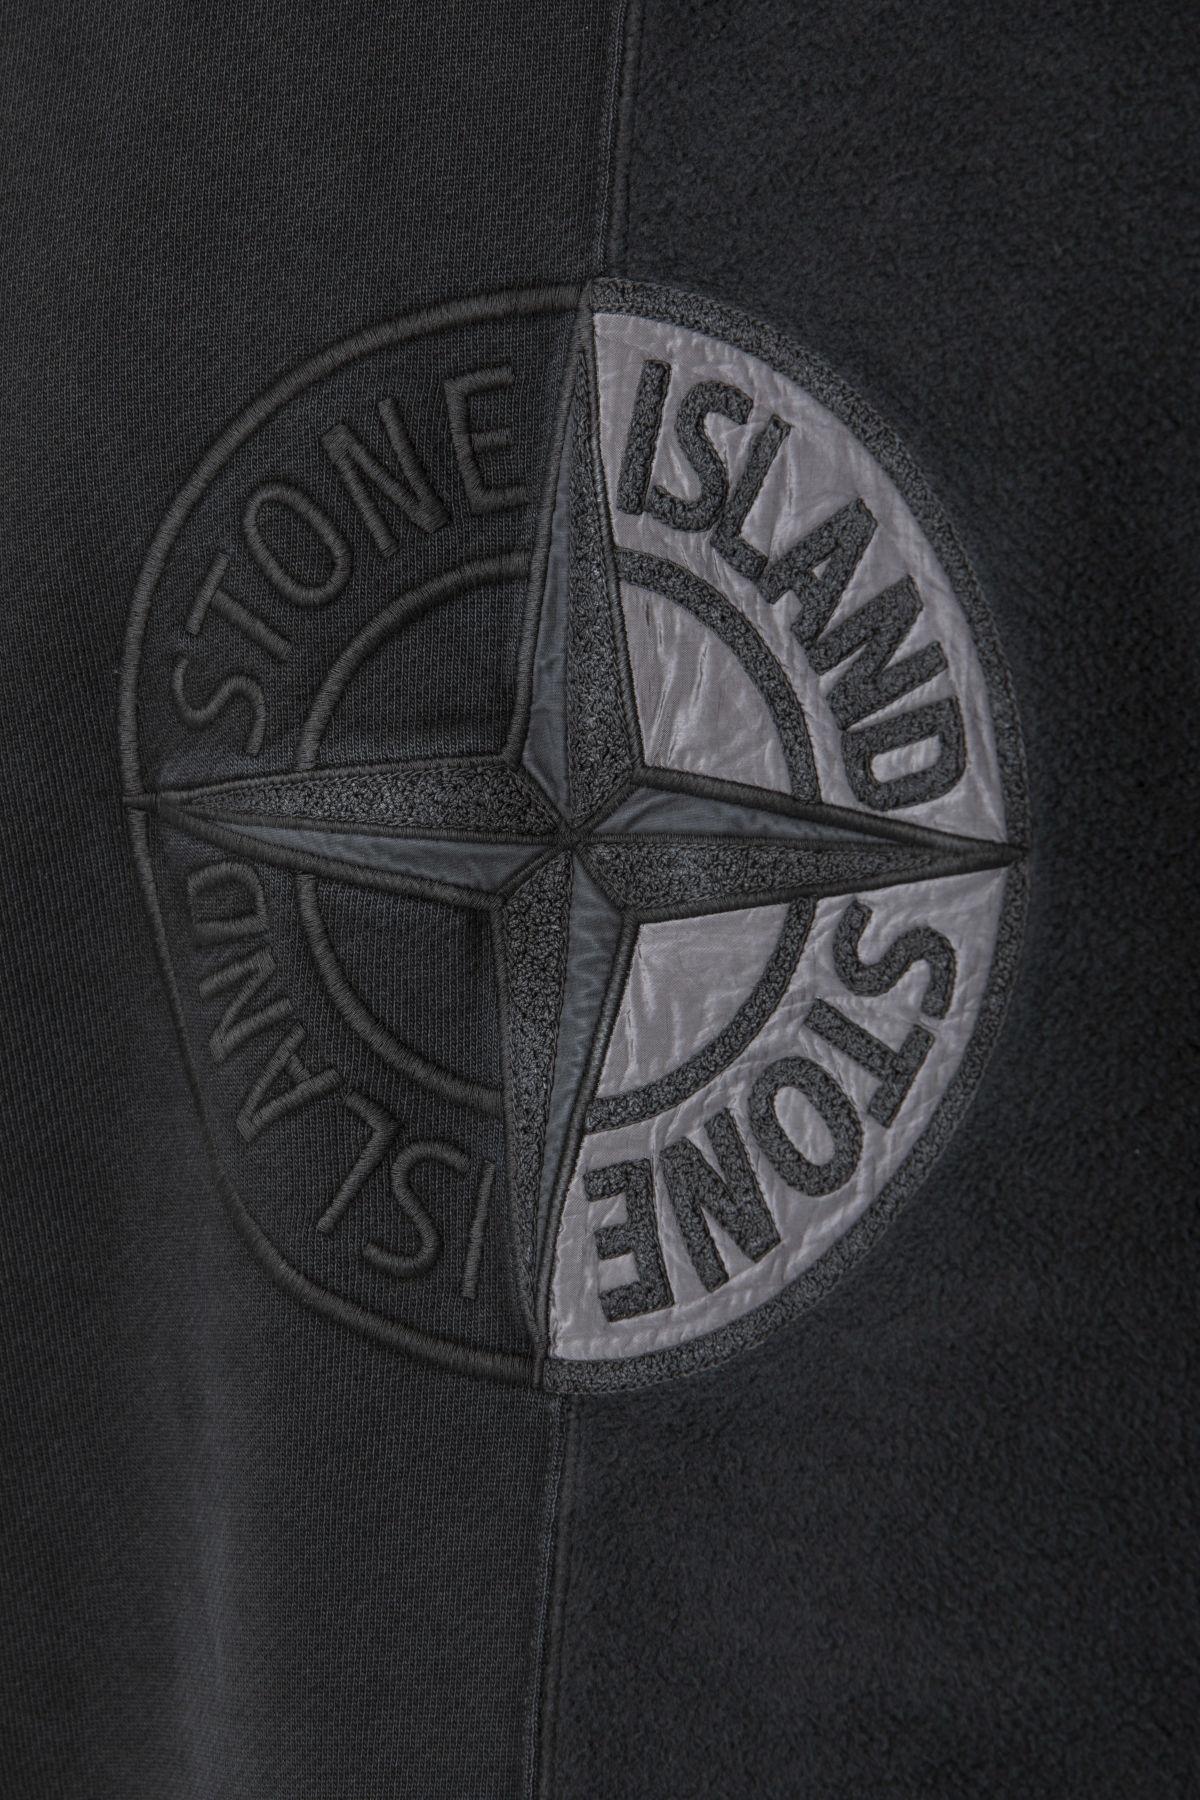 Felpa TINTO OLD per uomo STONE ISLAND A/I 19-20